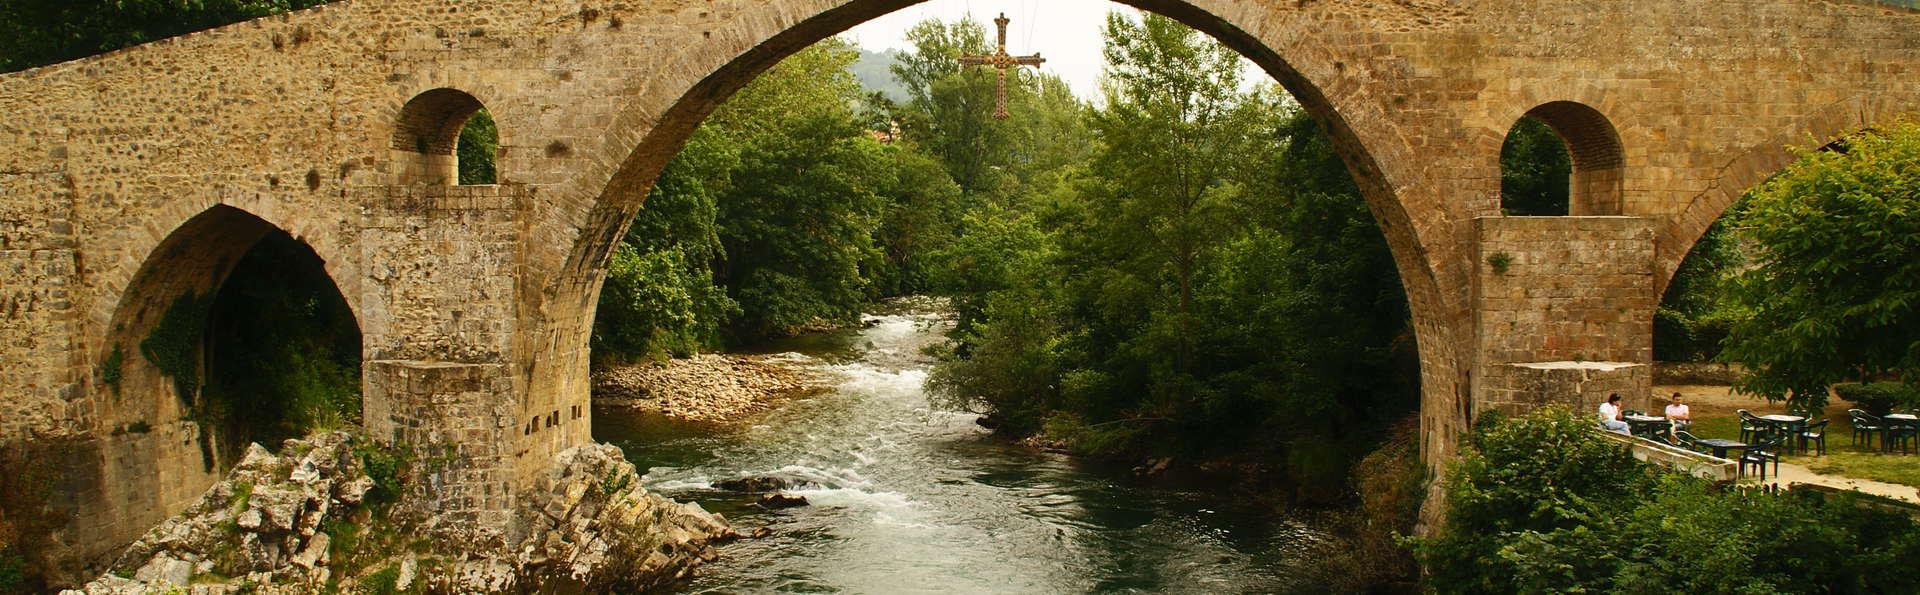 Grupo Hotelero La Pasera - Roman_bridge_at_Cangas_1_com.jpg